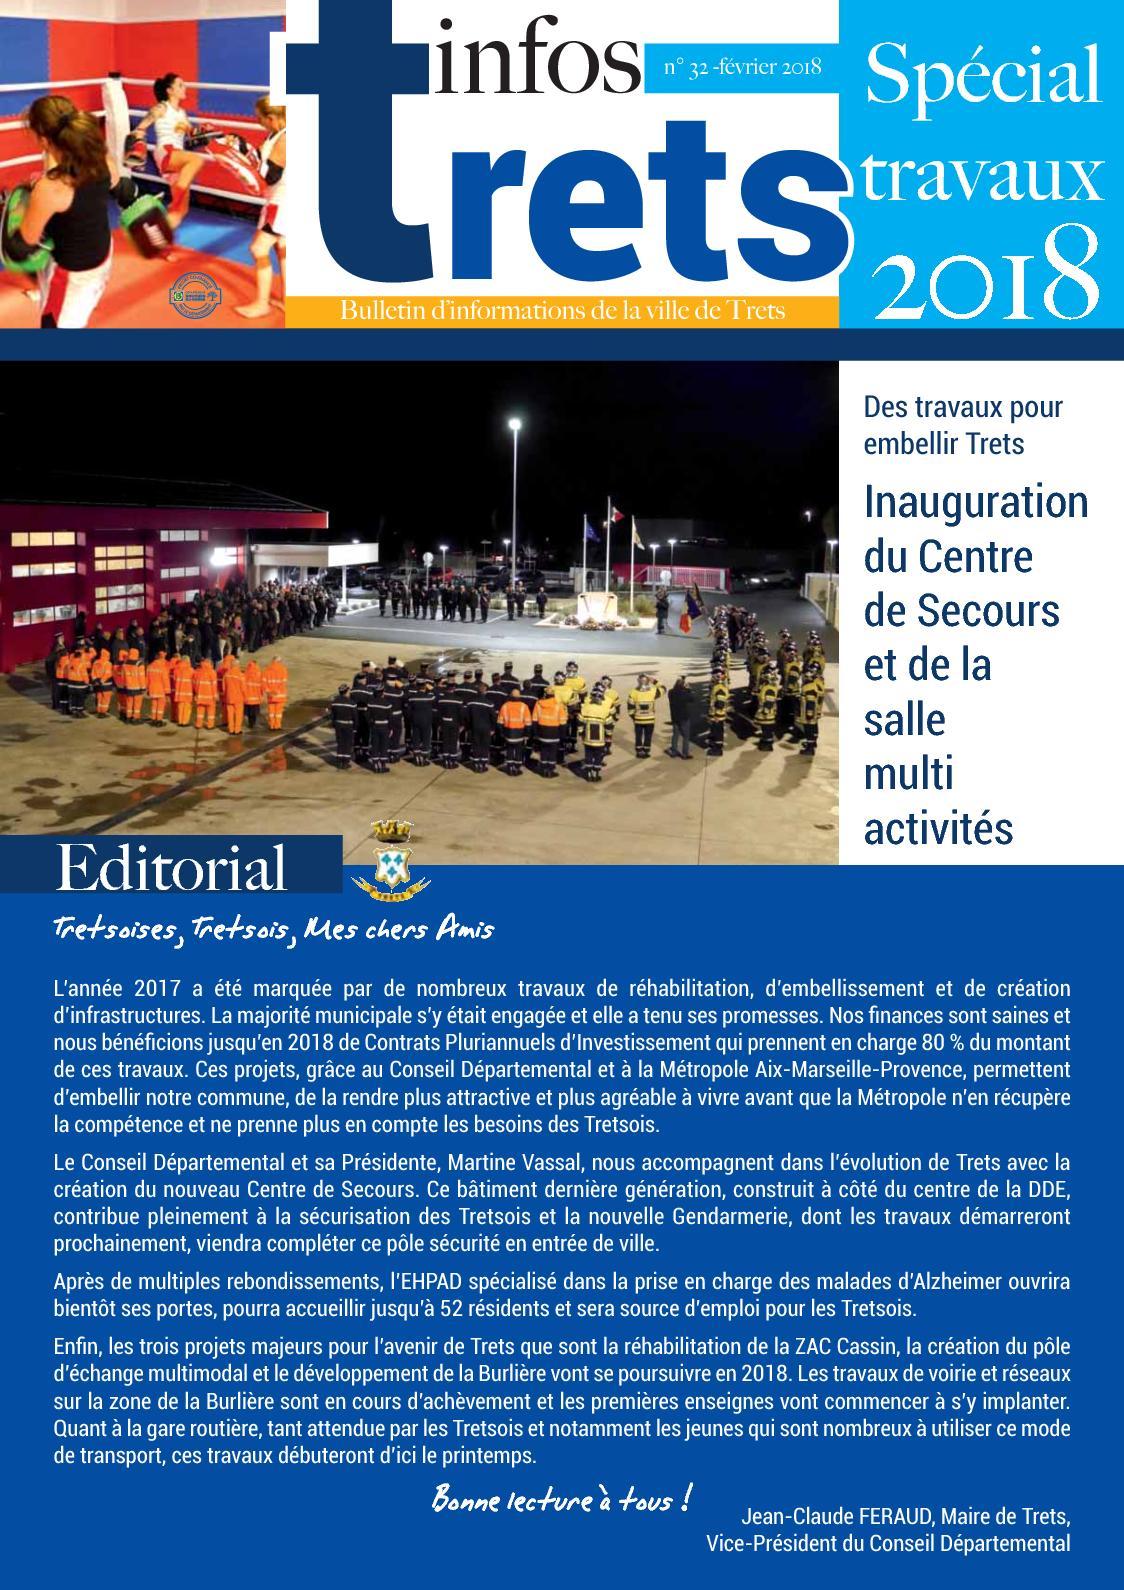 03840112662 Calaméo - Trets Infos N°32 - Spécial Travaux - Février 2018